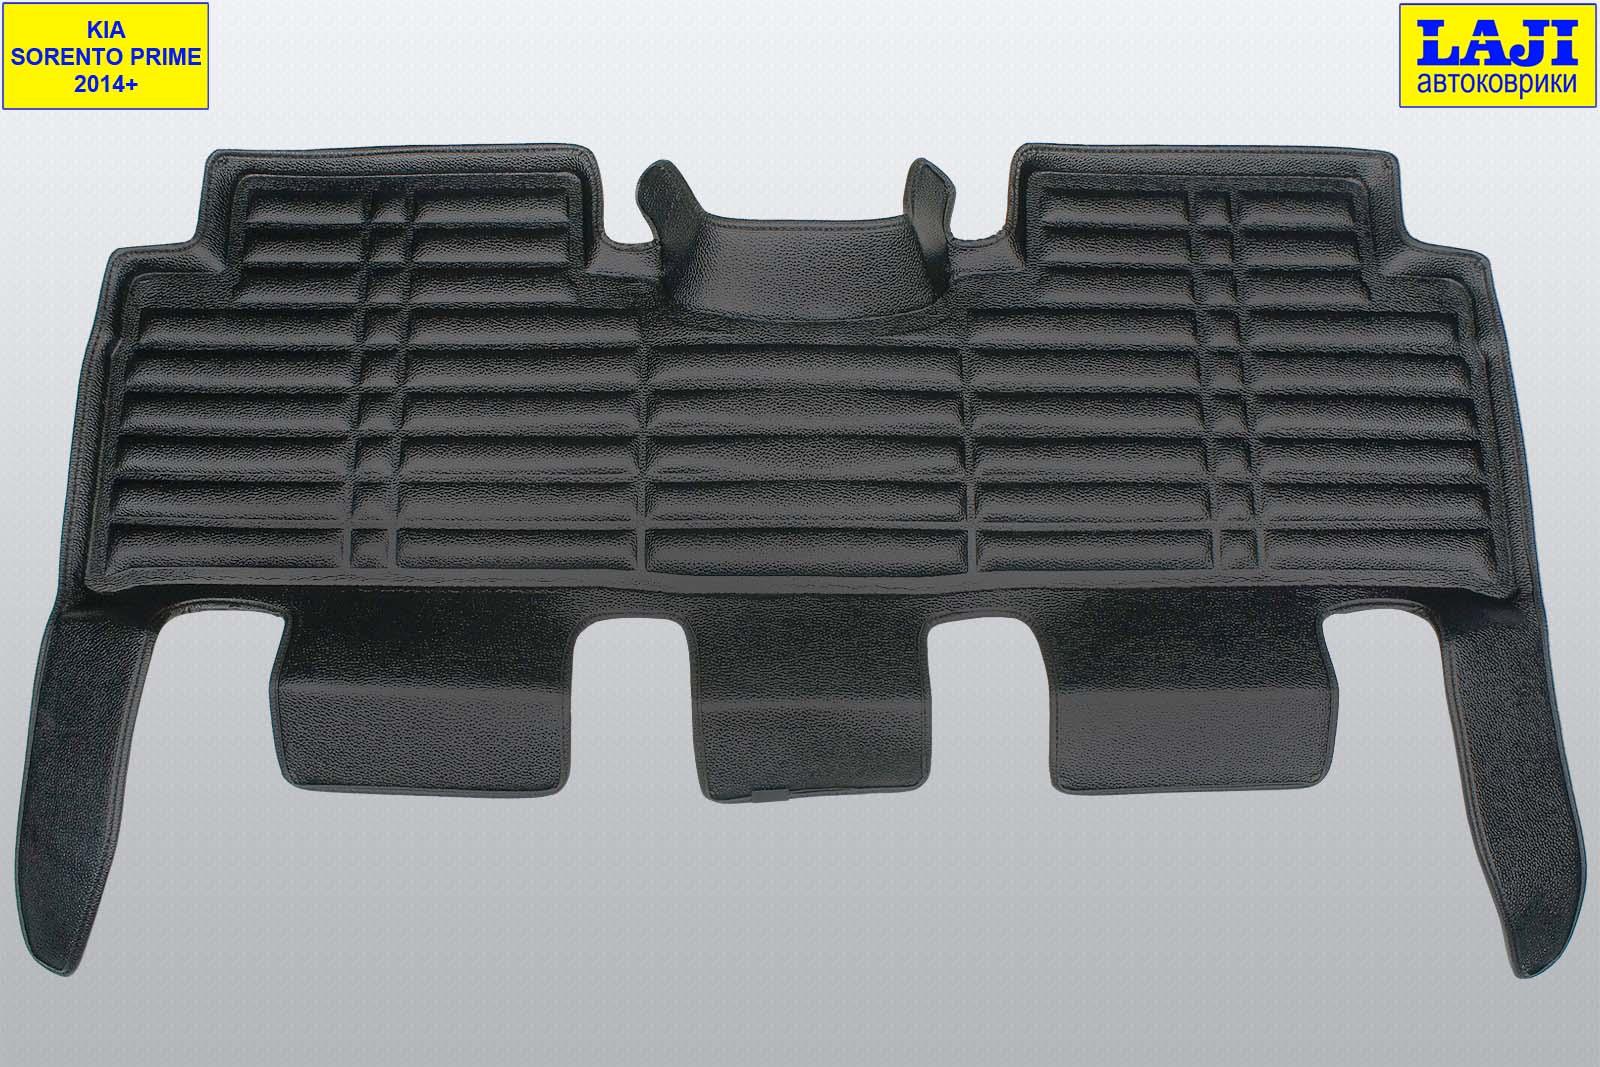 5D коврики в салон KIA Sorento Prime UM 2014-2020 10